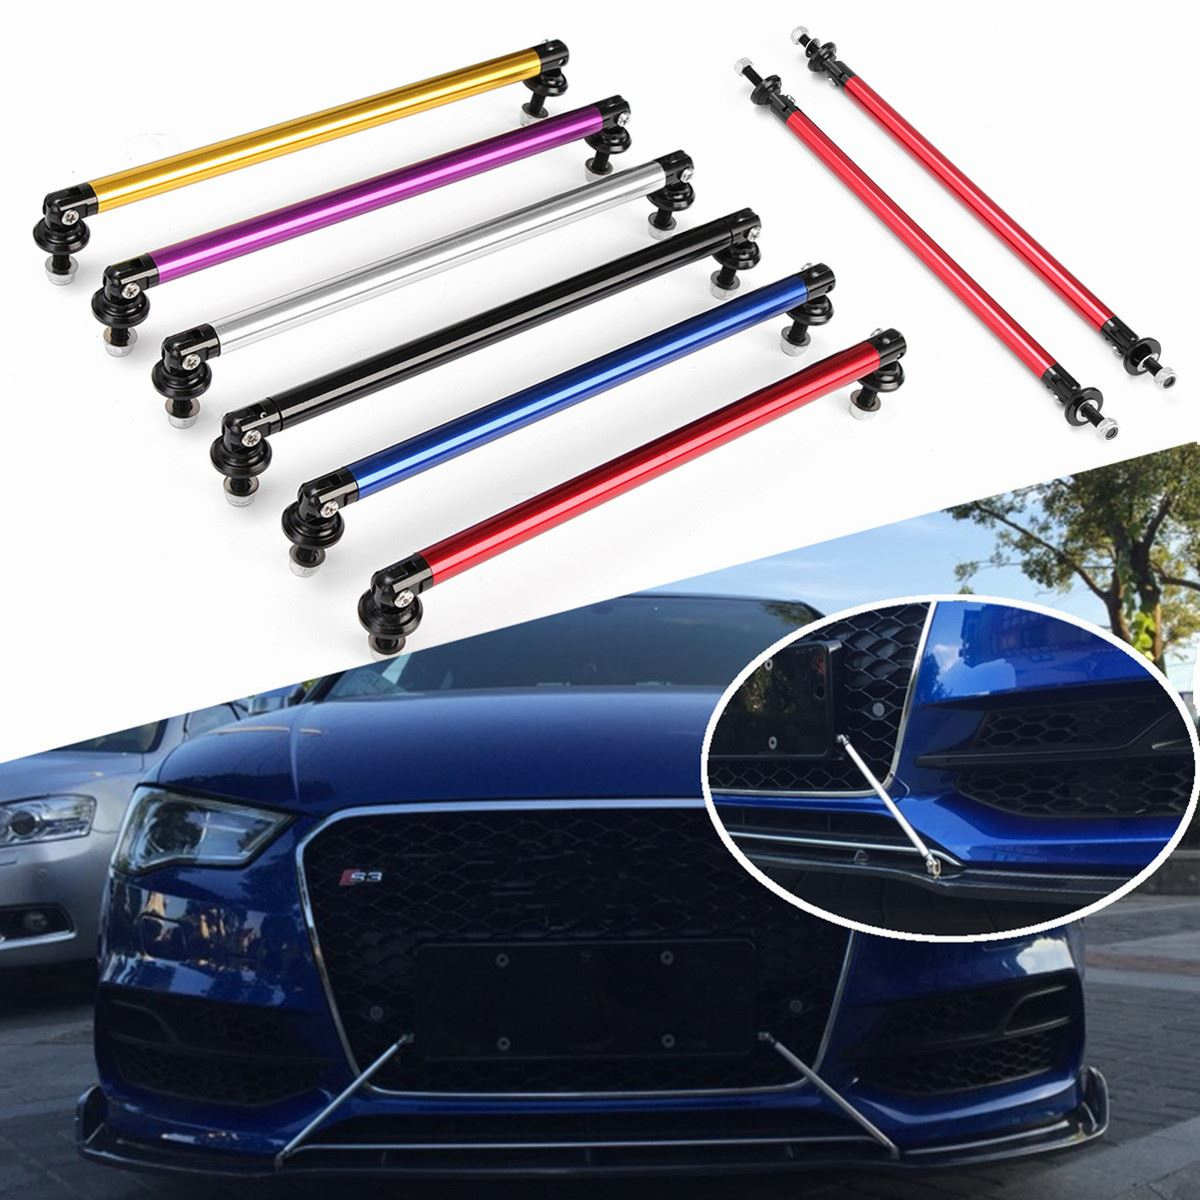 2x Universal 200mm Adjustable Front Rear Bumper Lip Splitter Rod Support Bars